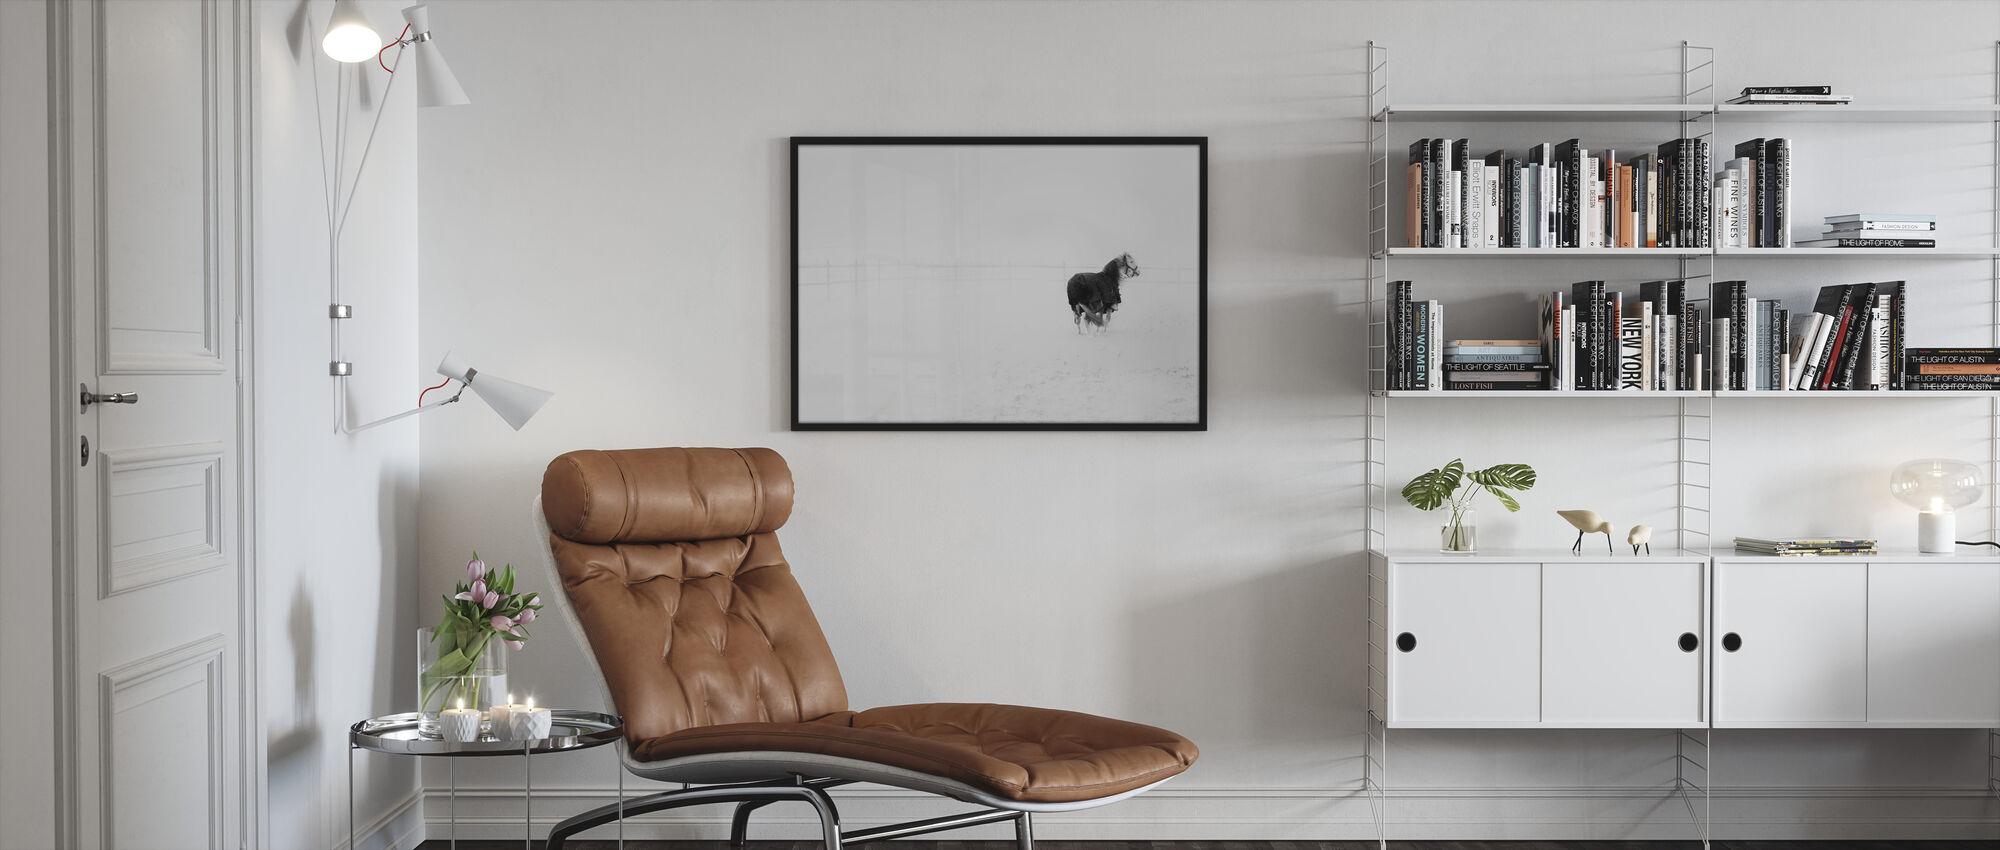 Horse in Snowstorm - Framed print - Living Room